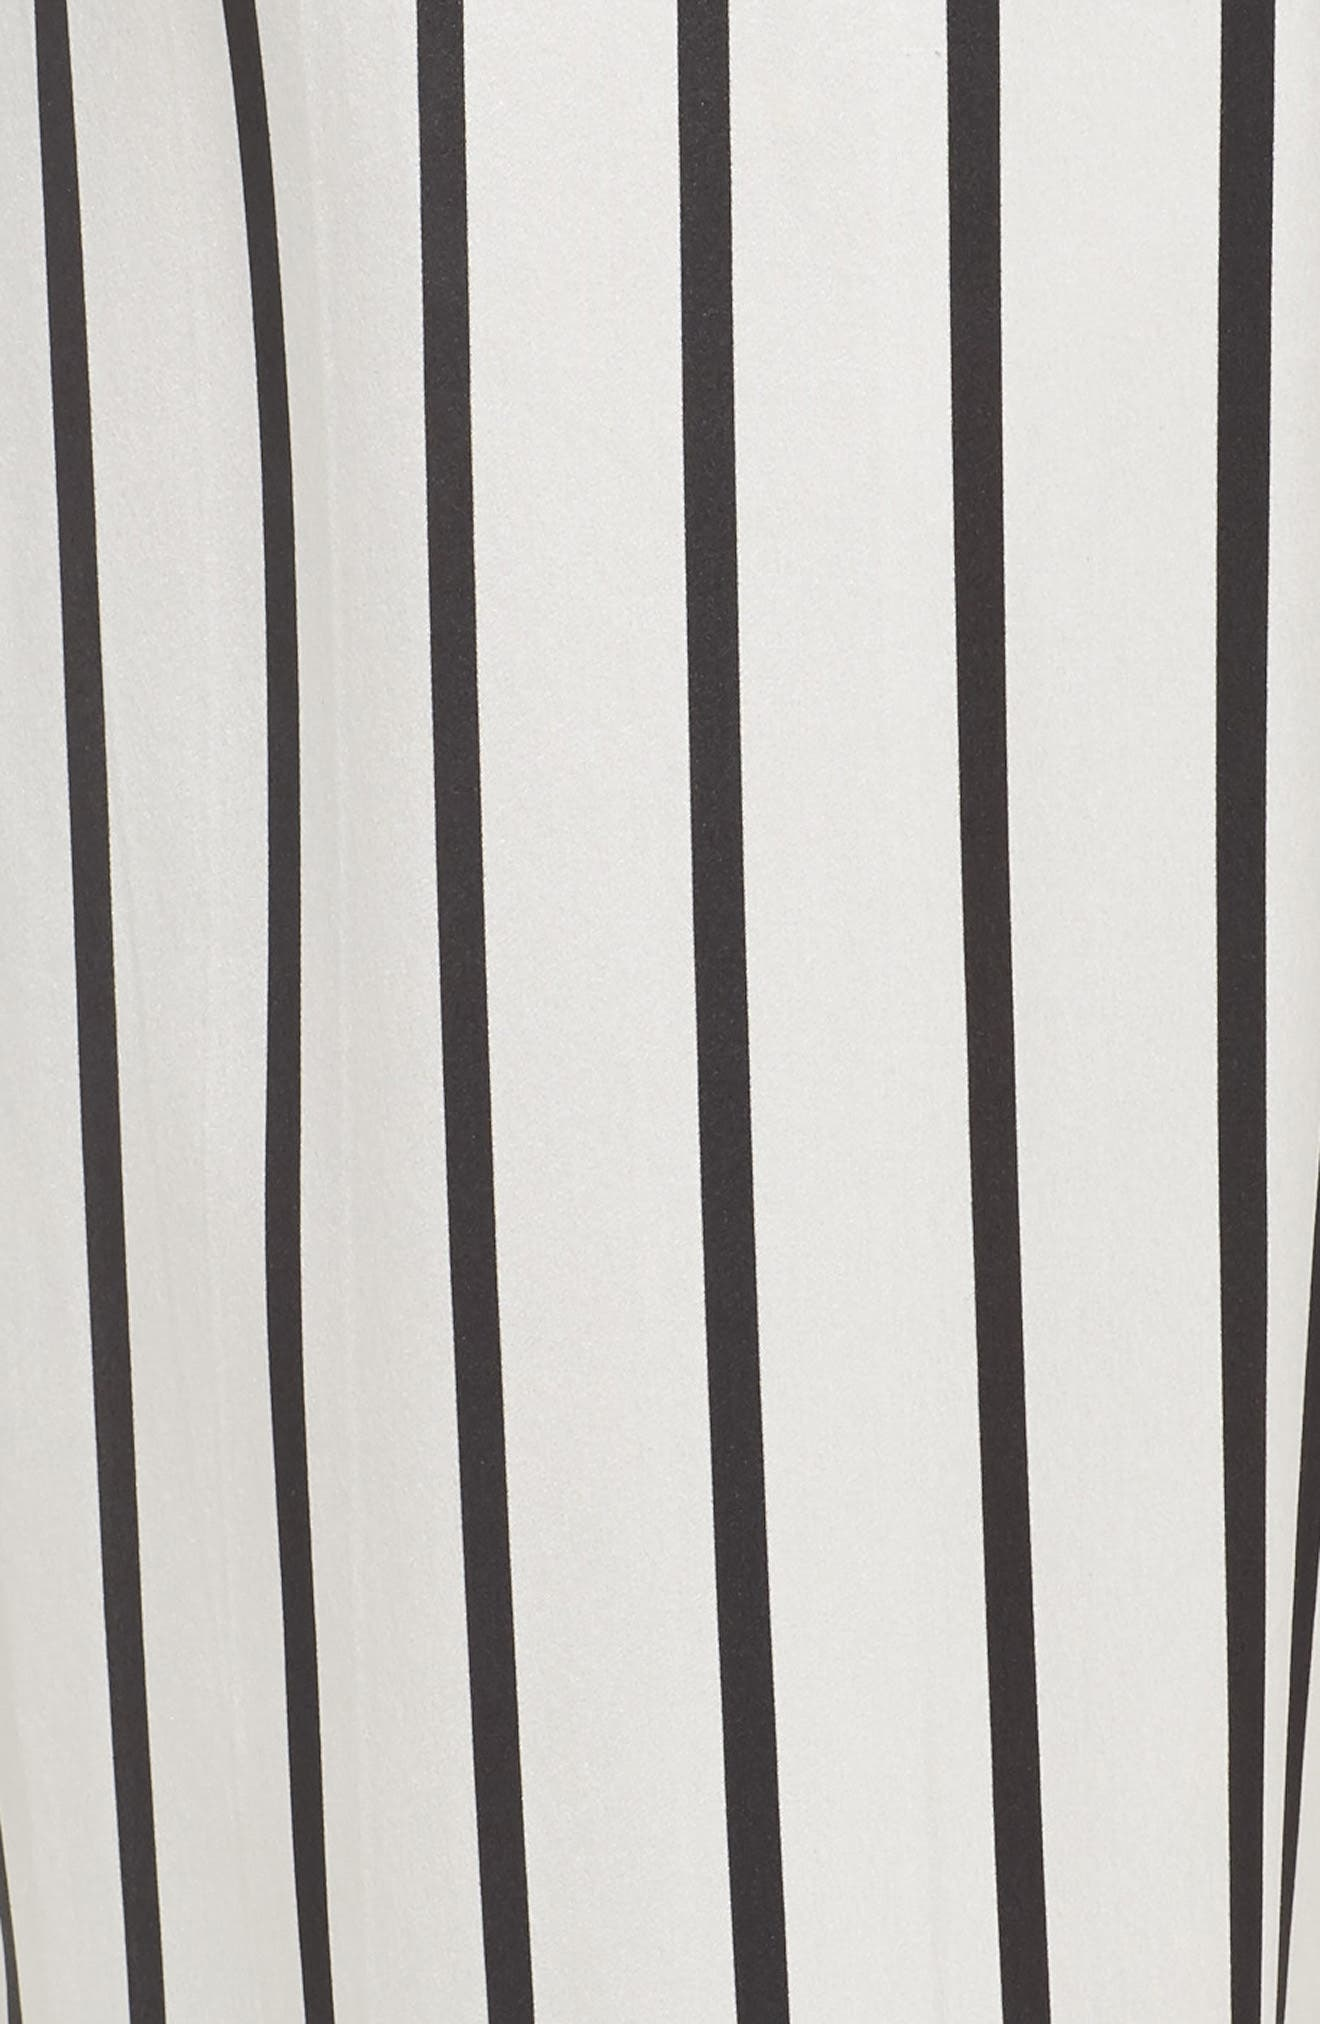 Stripe Silk Pajama Pants,                             Alternate thumbnail 7, color,                             Jet Black Stripe